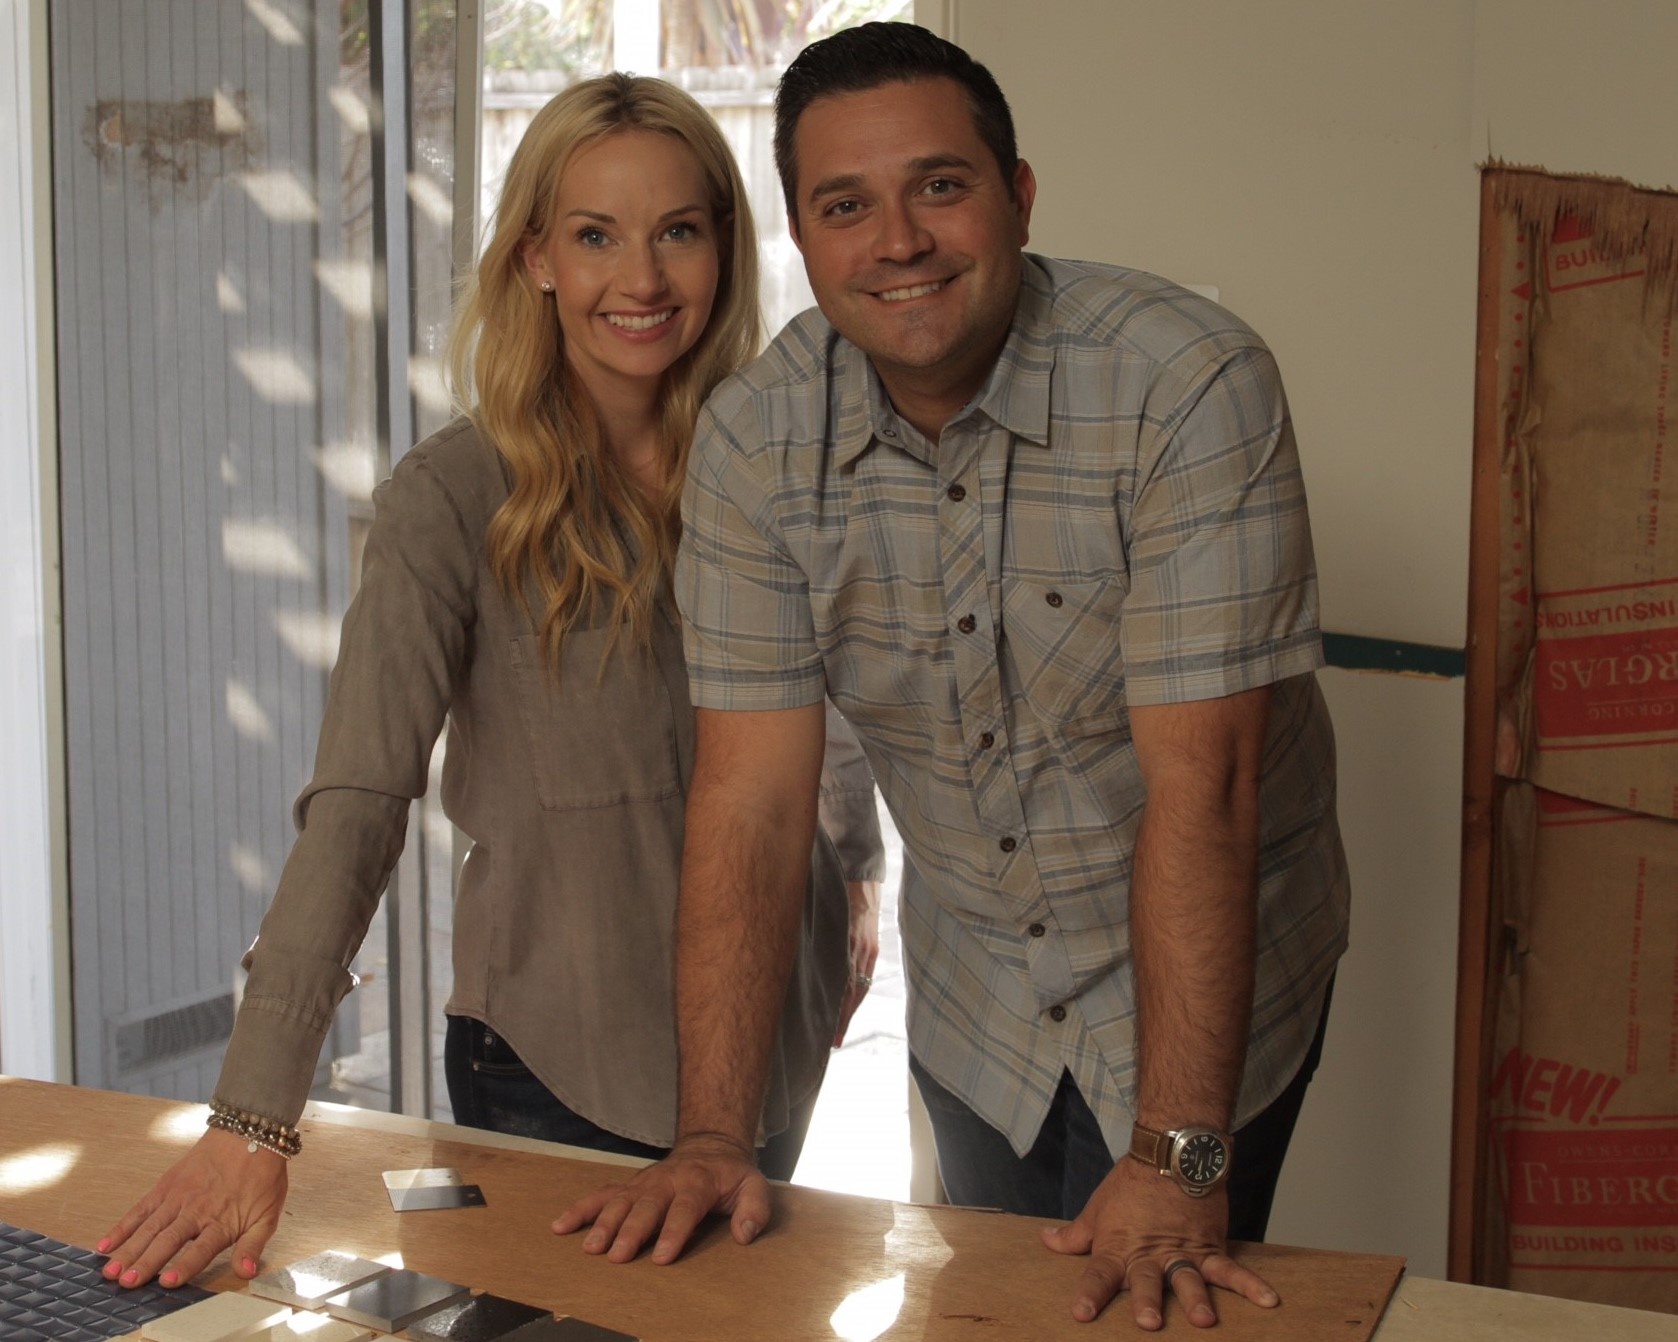 Jessie & Tina Rodriguez of HGTV's 'Vintage Flip' - CROPPED